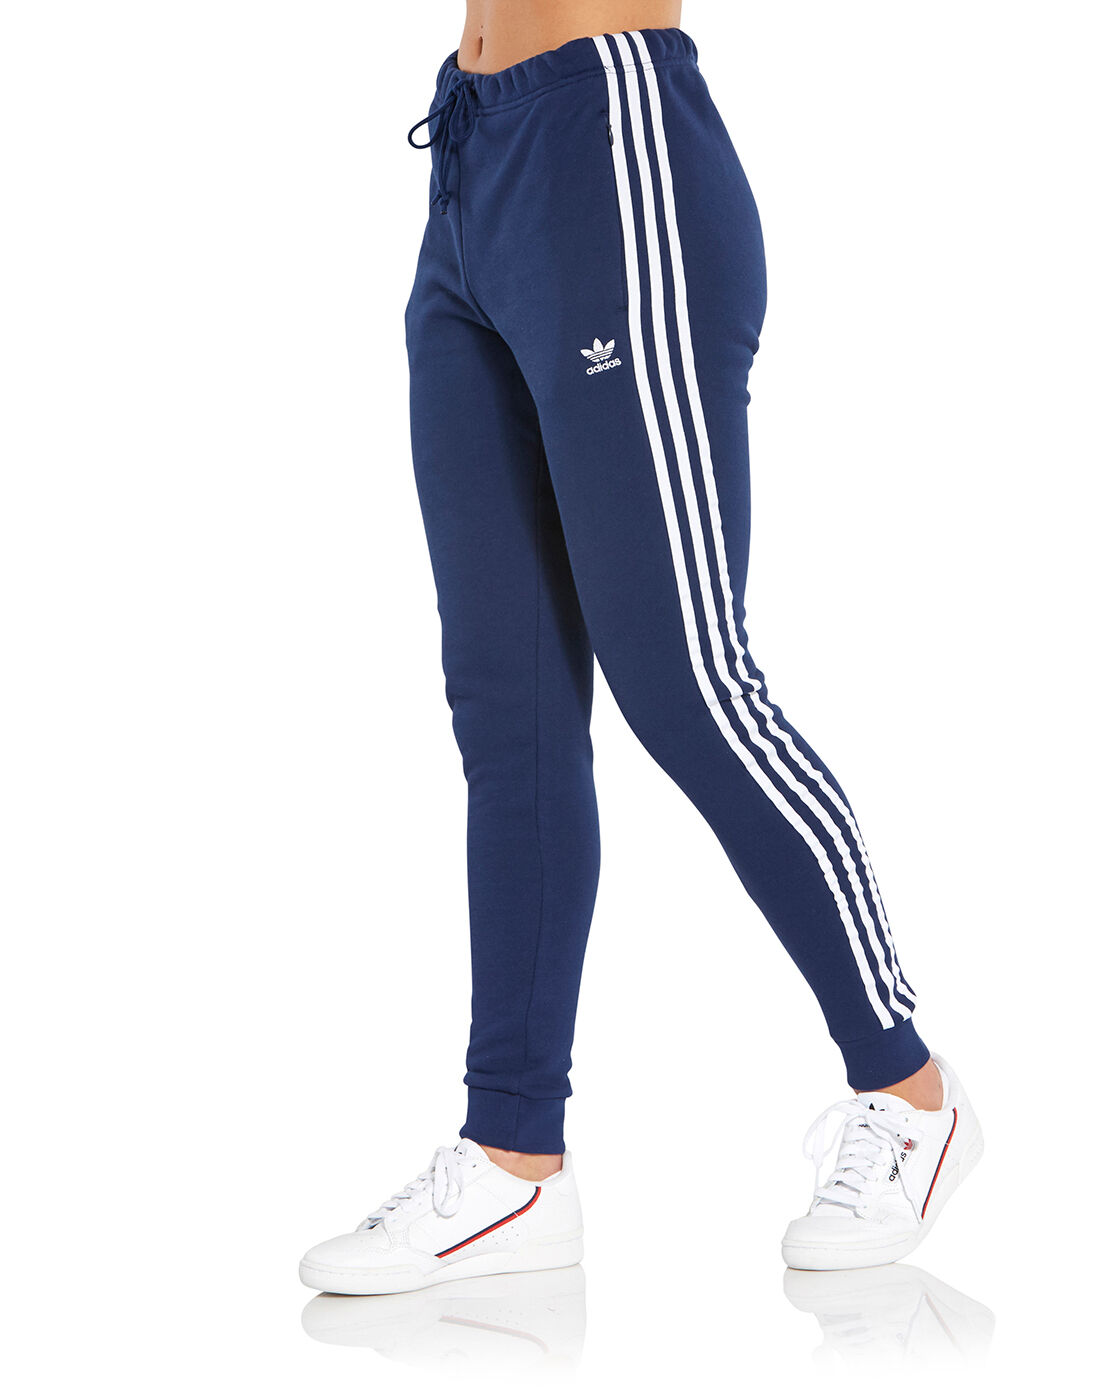 adidas Messi Track Pants Junior | Rhys | Pants, Jeans pants